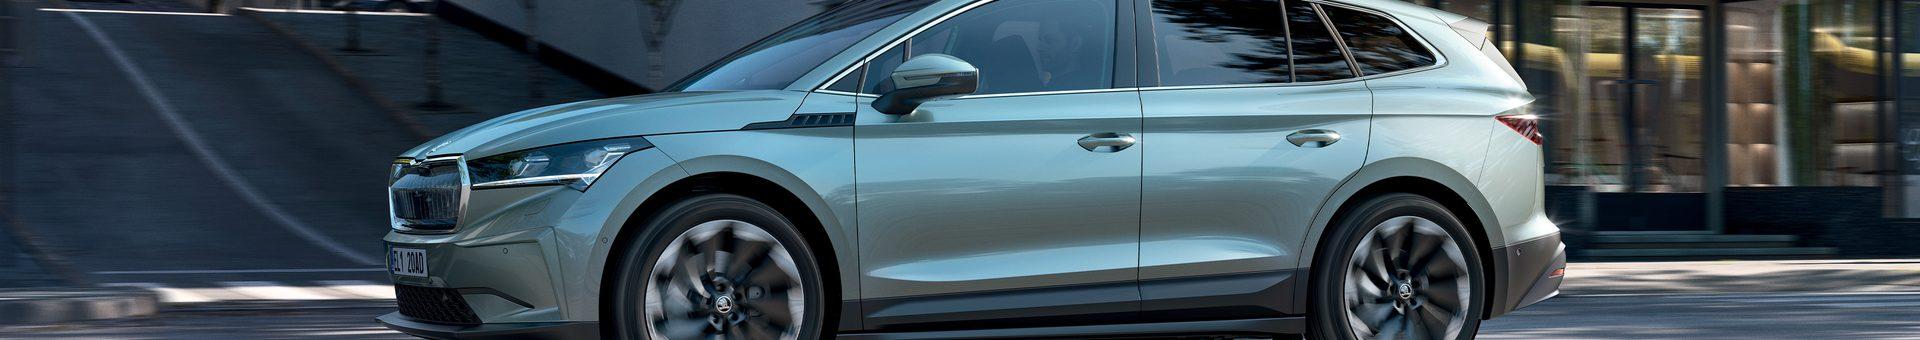 Škoda ENYAQ iV - Plně elektrické SUV